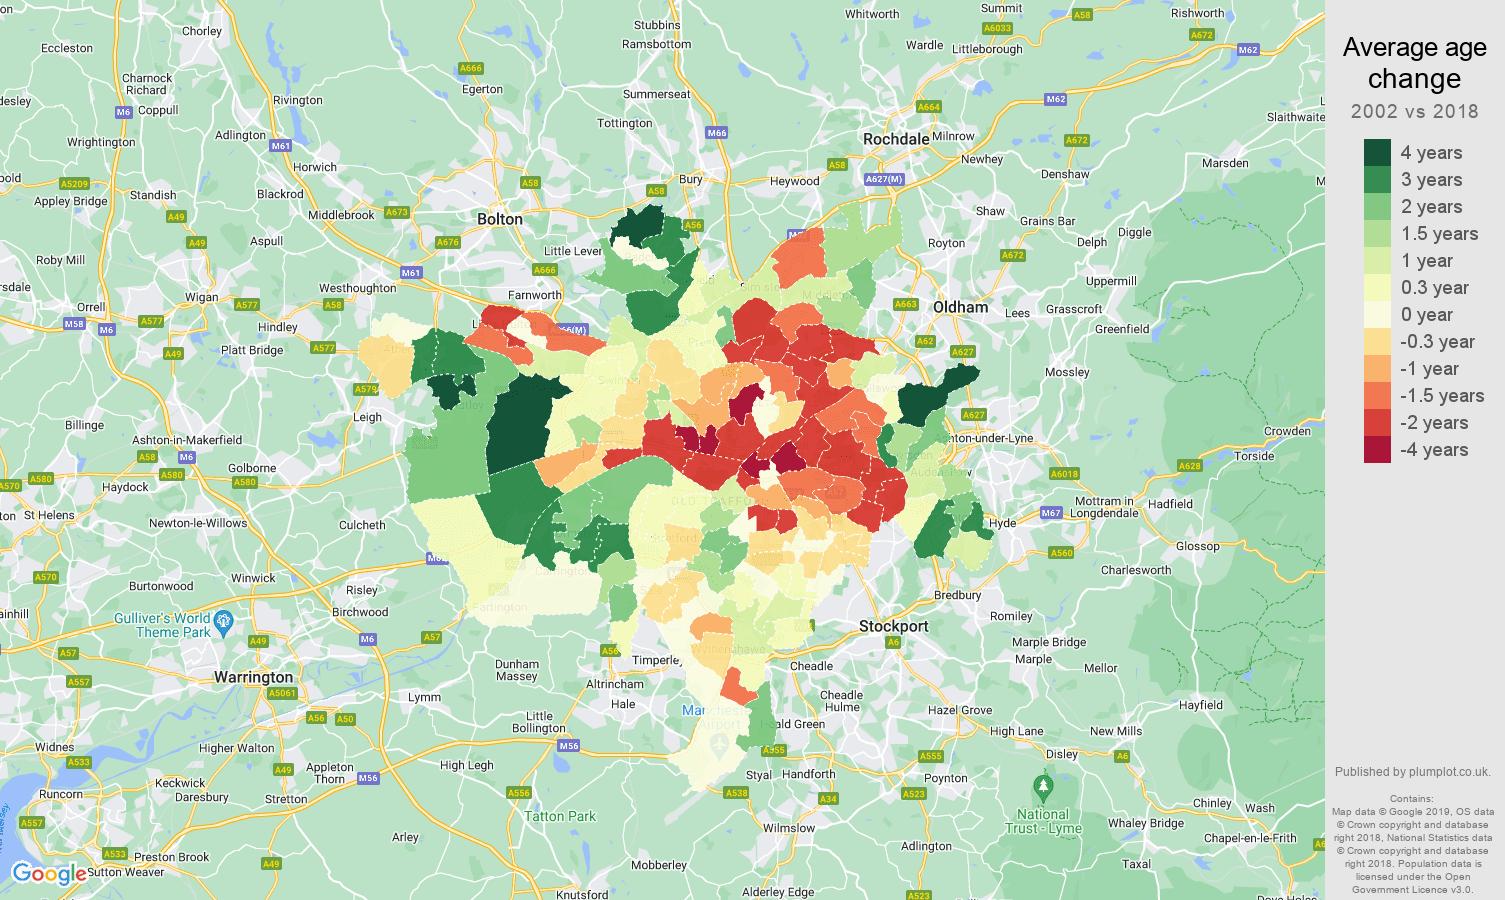 Manchester average age change map